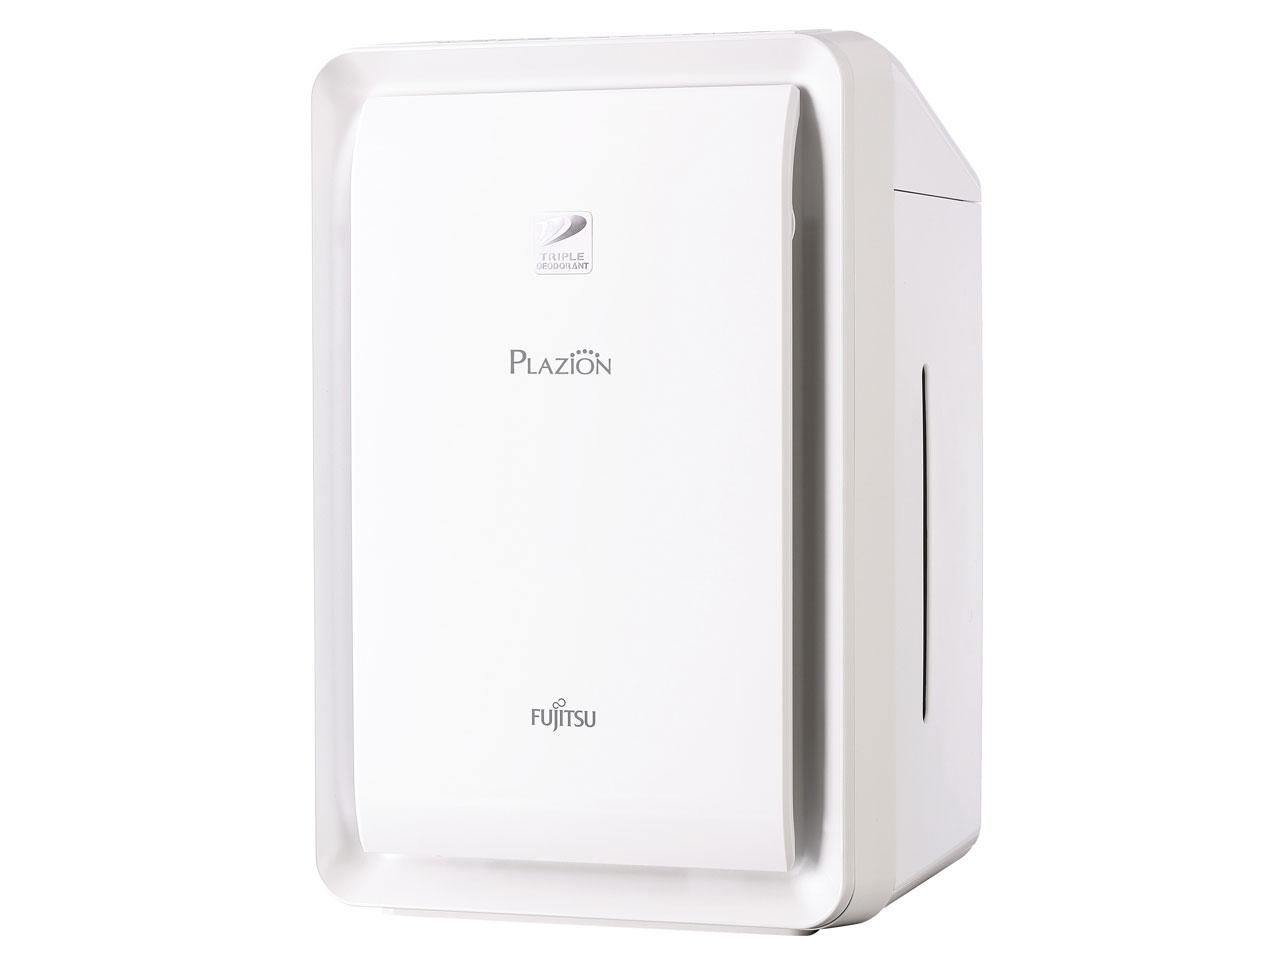 PLAZION DAS-303K の製品画像